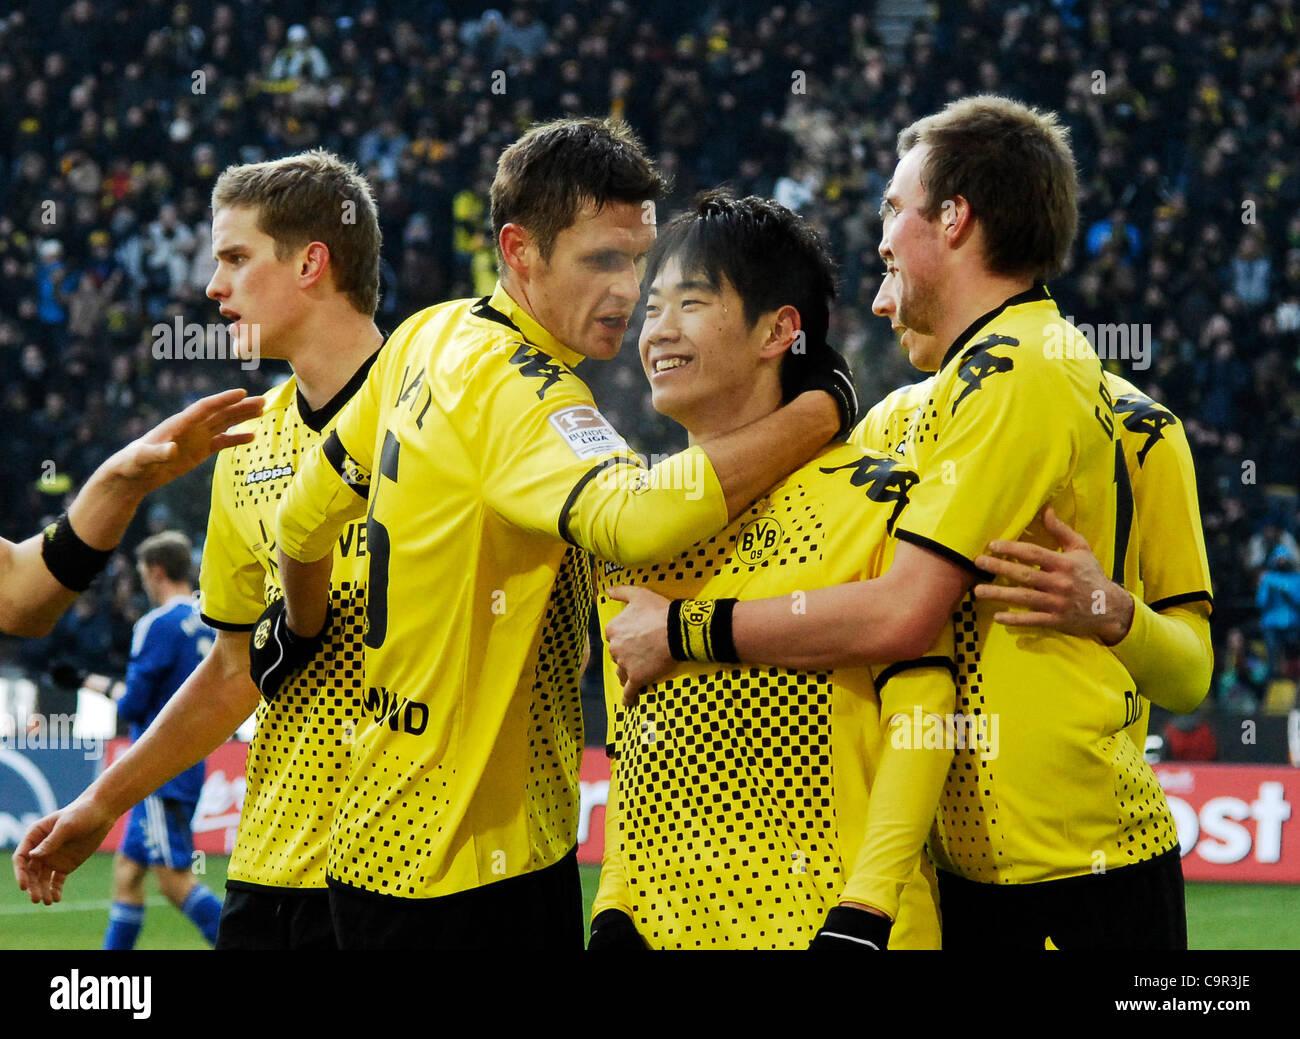 1.Fussball-Bundesliga, Saison 2011/2012, 21. Spieltag Borussia Bortmund gegen  Bayer 04 Leverkusen 1:0 ---Shinji - Stock Image